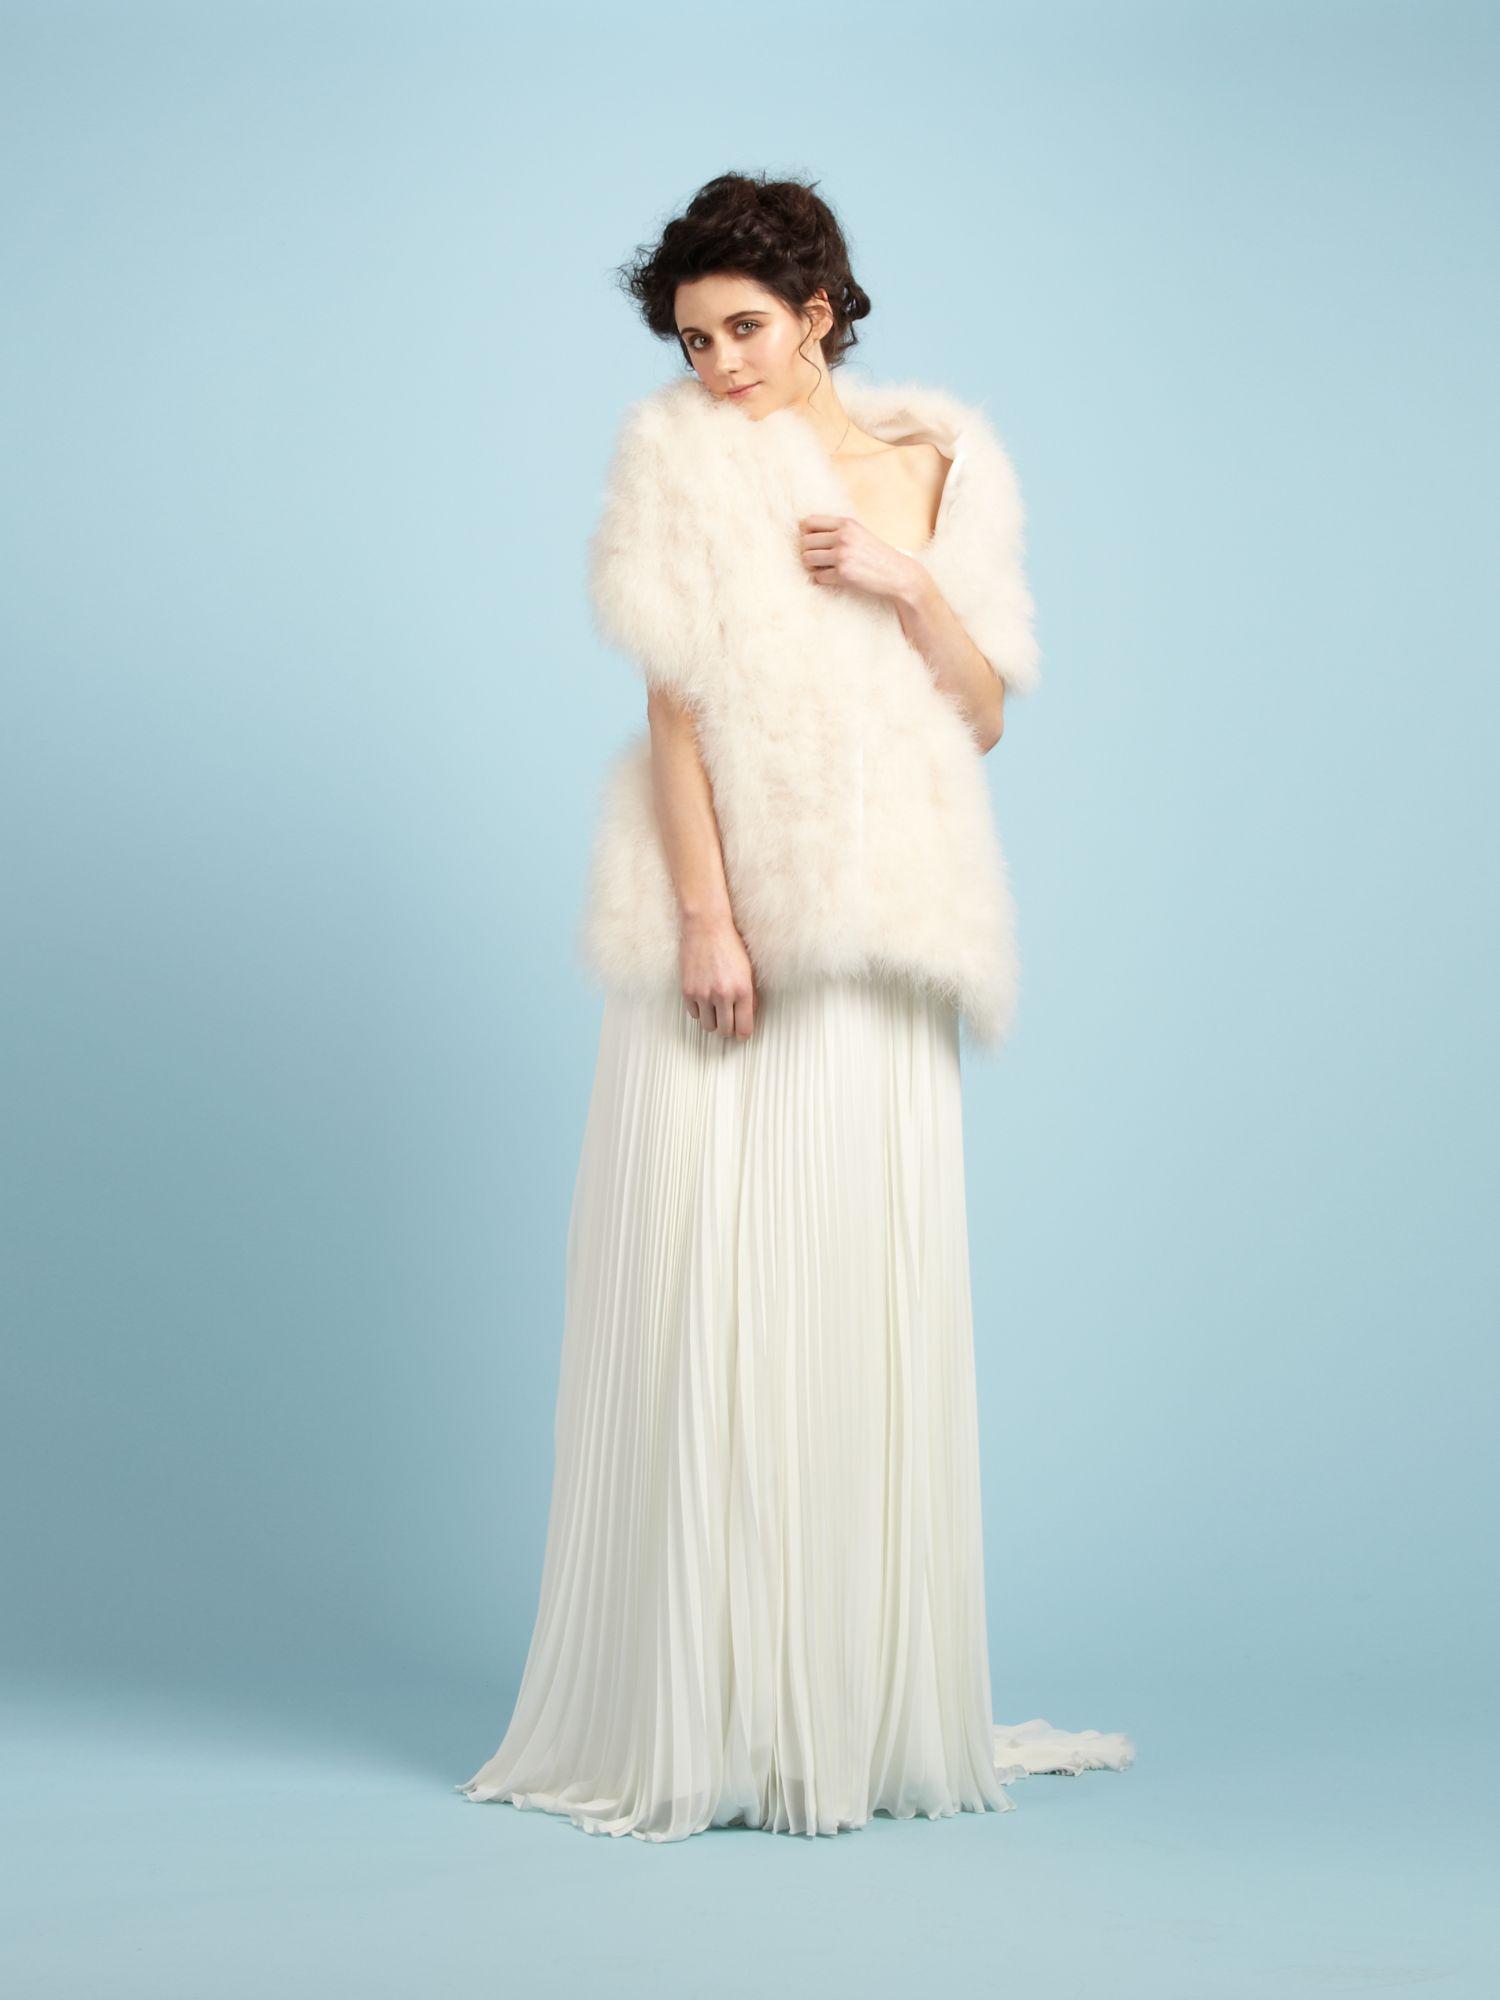 Lyst - Biba Marabou Feather Stole in White